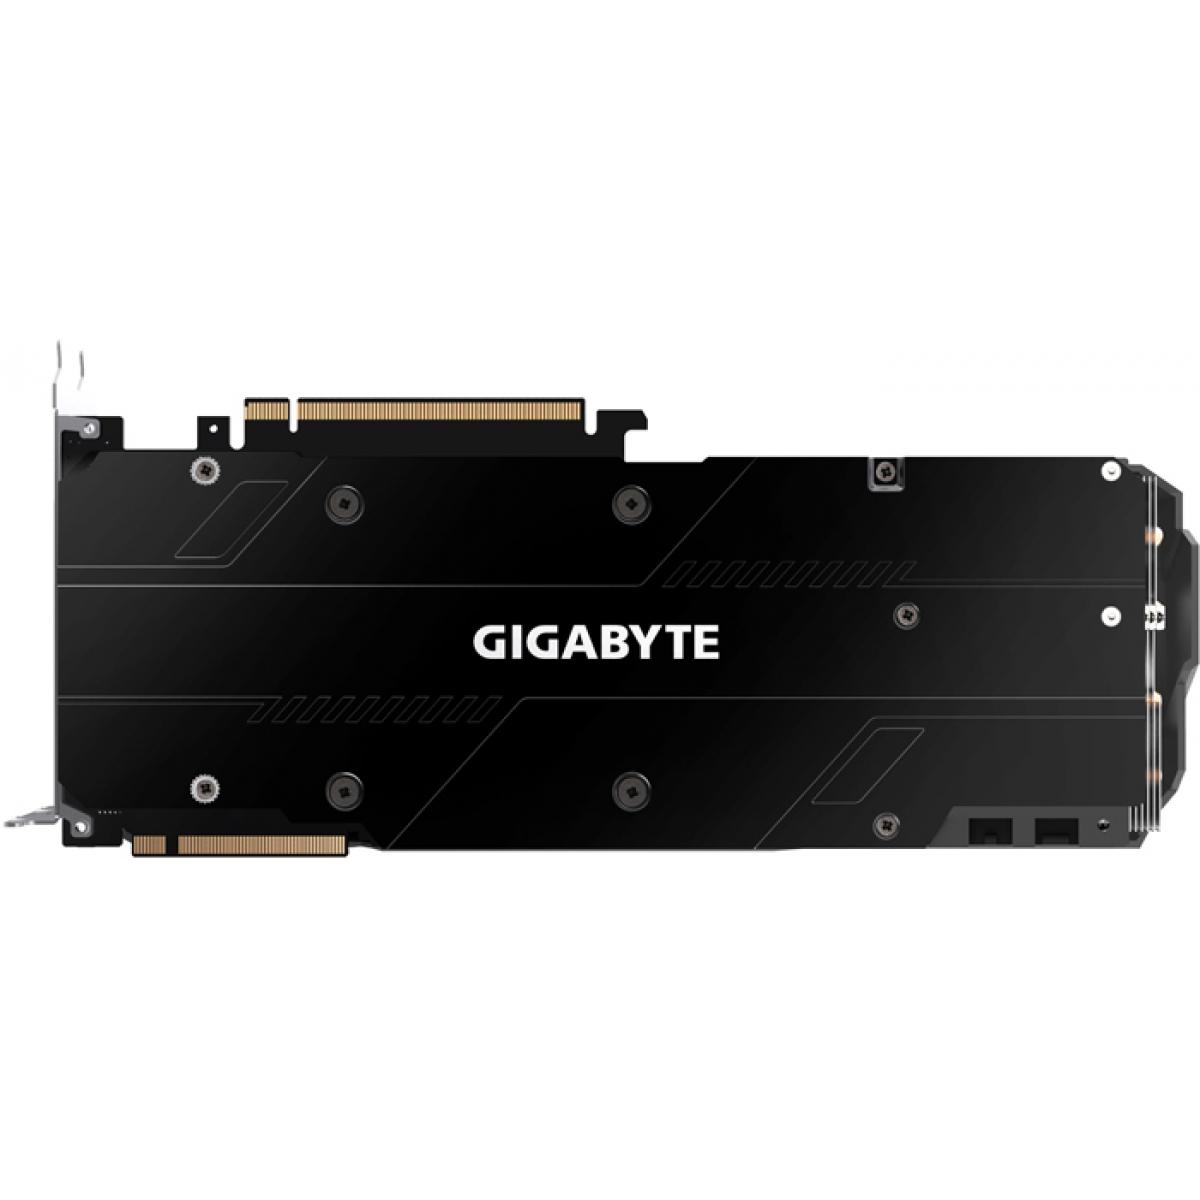 Placa De Vídeo Gigabyte Geforce RTX 2080 Windforce OC 8GB GV-N2080WF3OC-8GC GDDR6 PCI-EXP